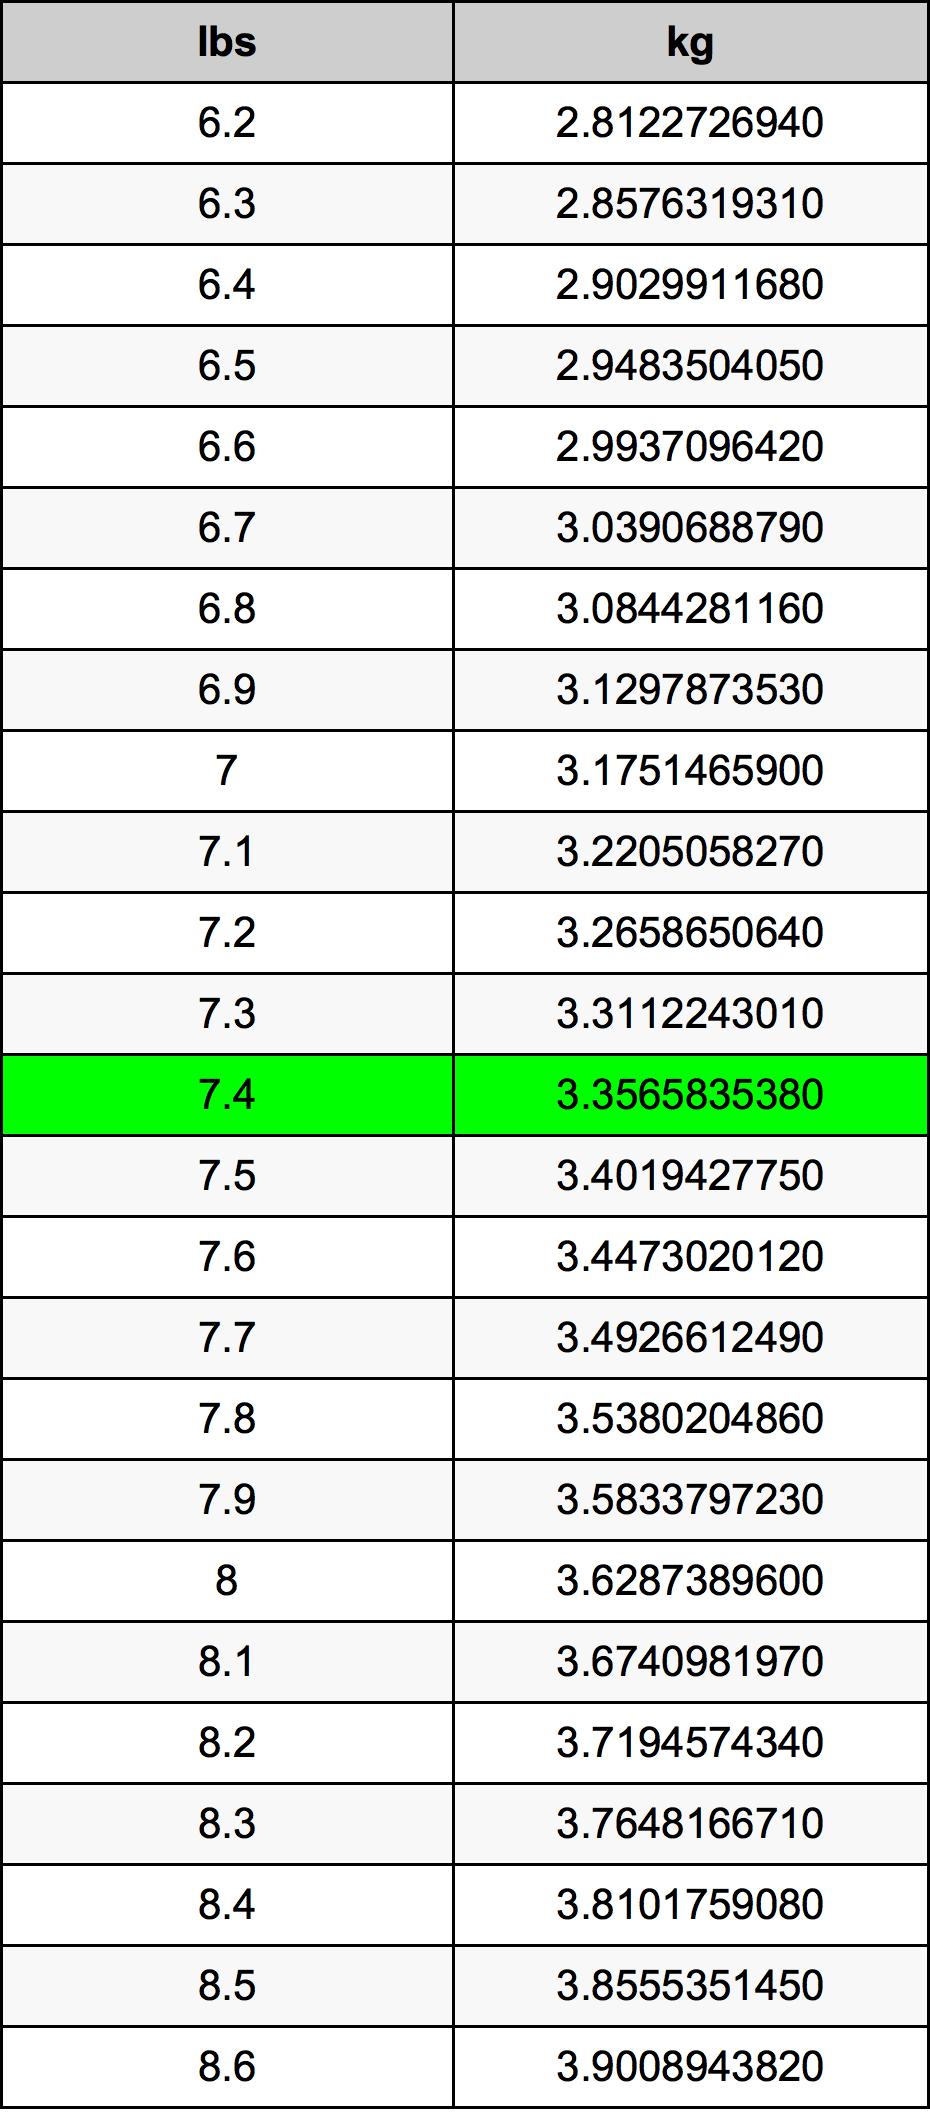 7.4 Libra konverteringstabellen